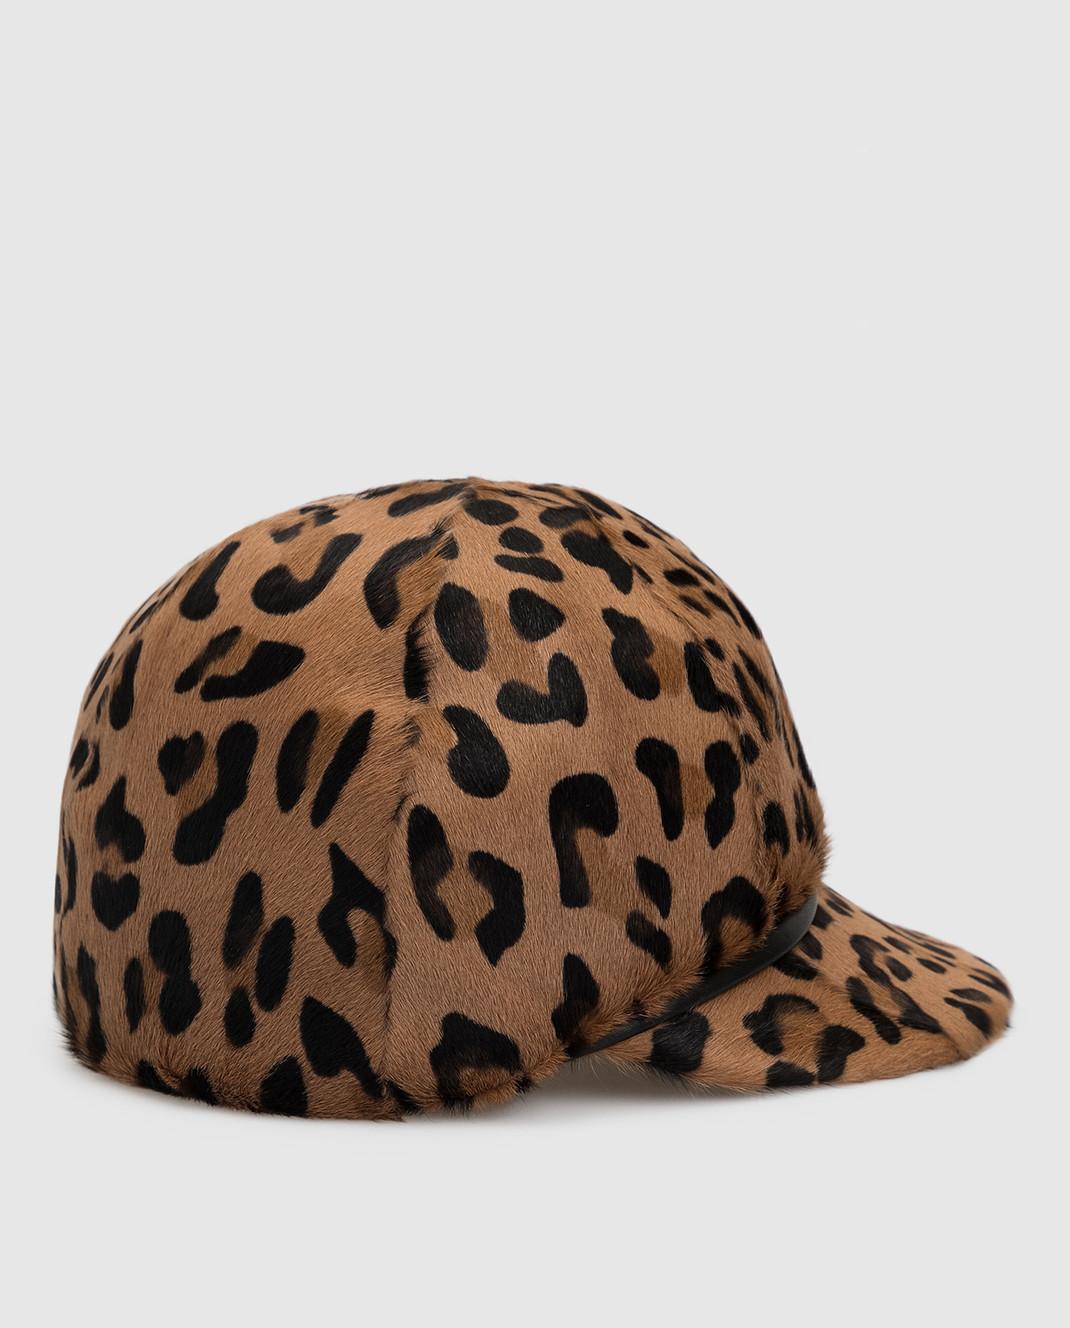 Simonetta Ravizza Бежевая шляпа изображение 3